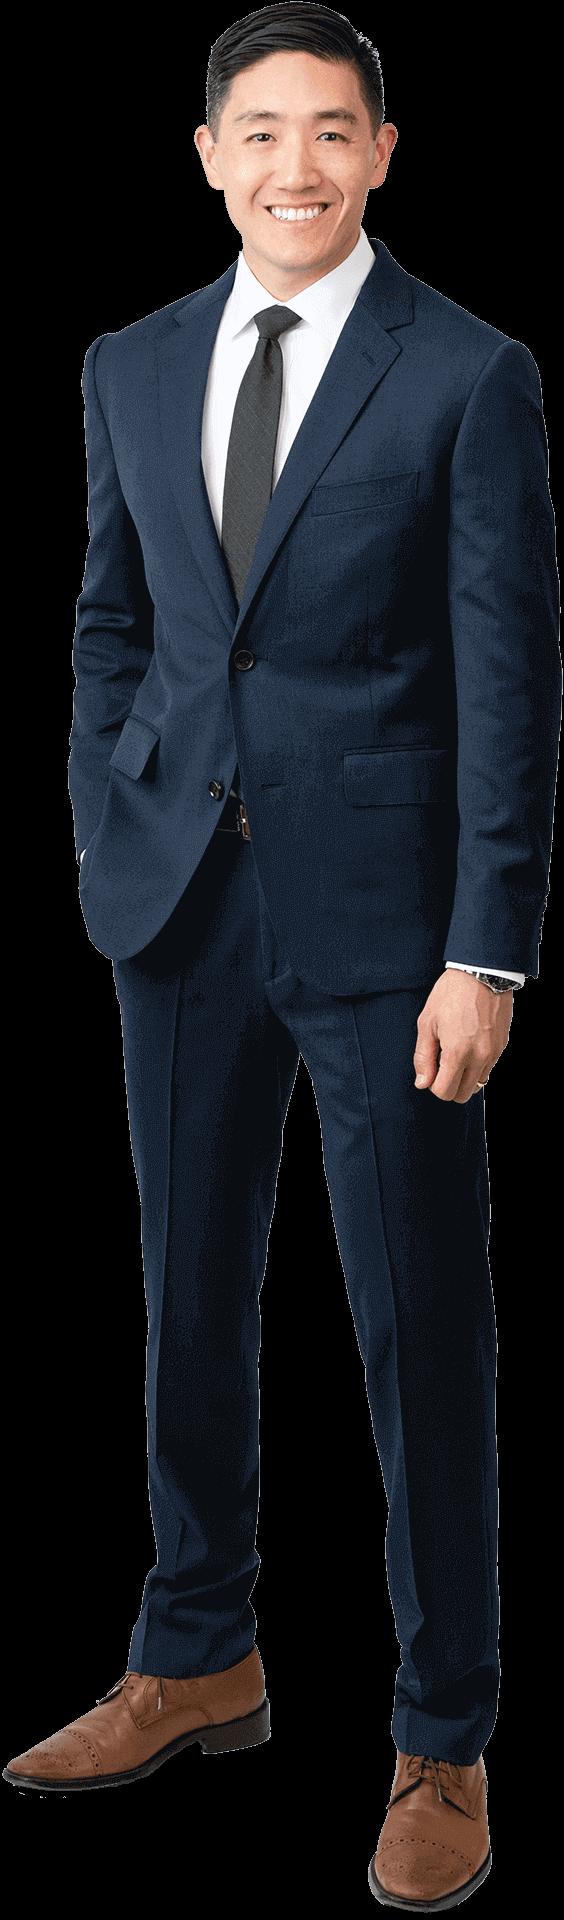 Jared Tanimoto Fee Only Investment Advisor Orange County California